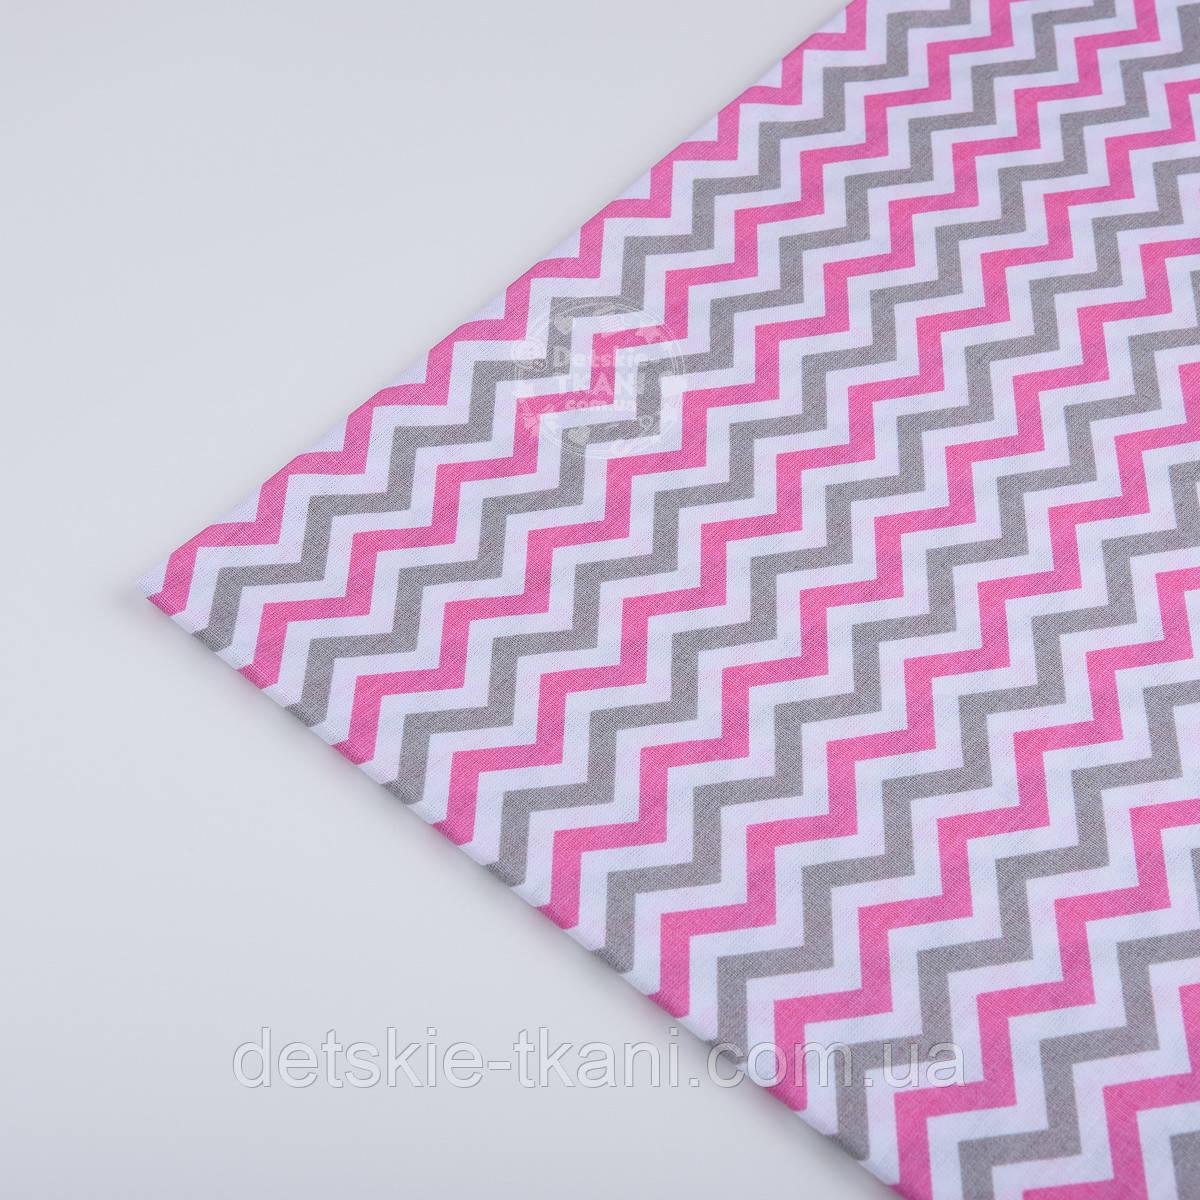 Лоскут ткани №1120 с густым зигзагом серо-малинового цвета